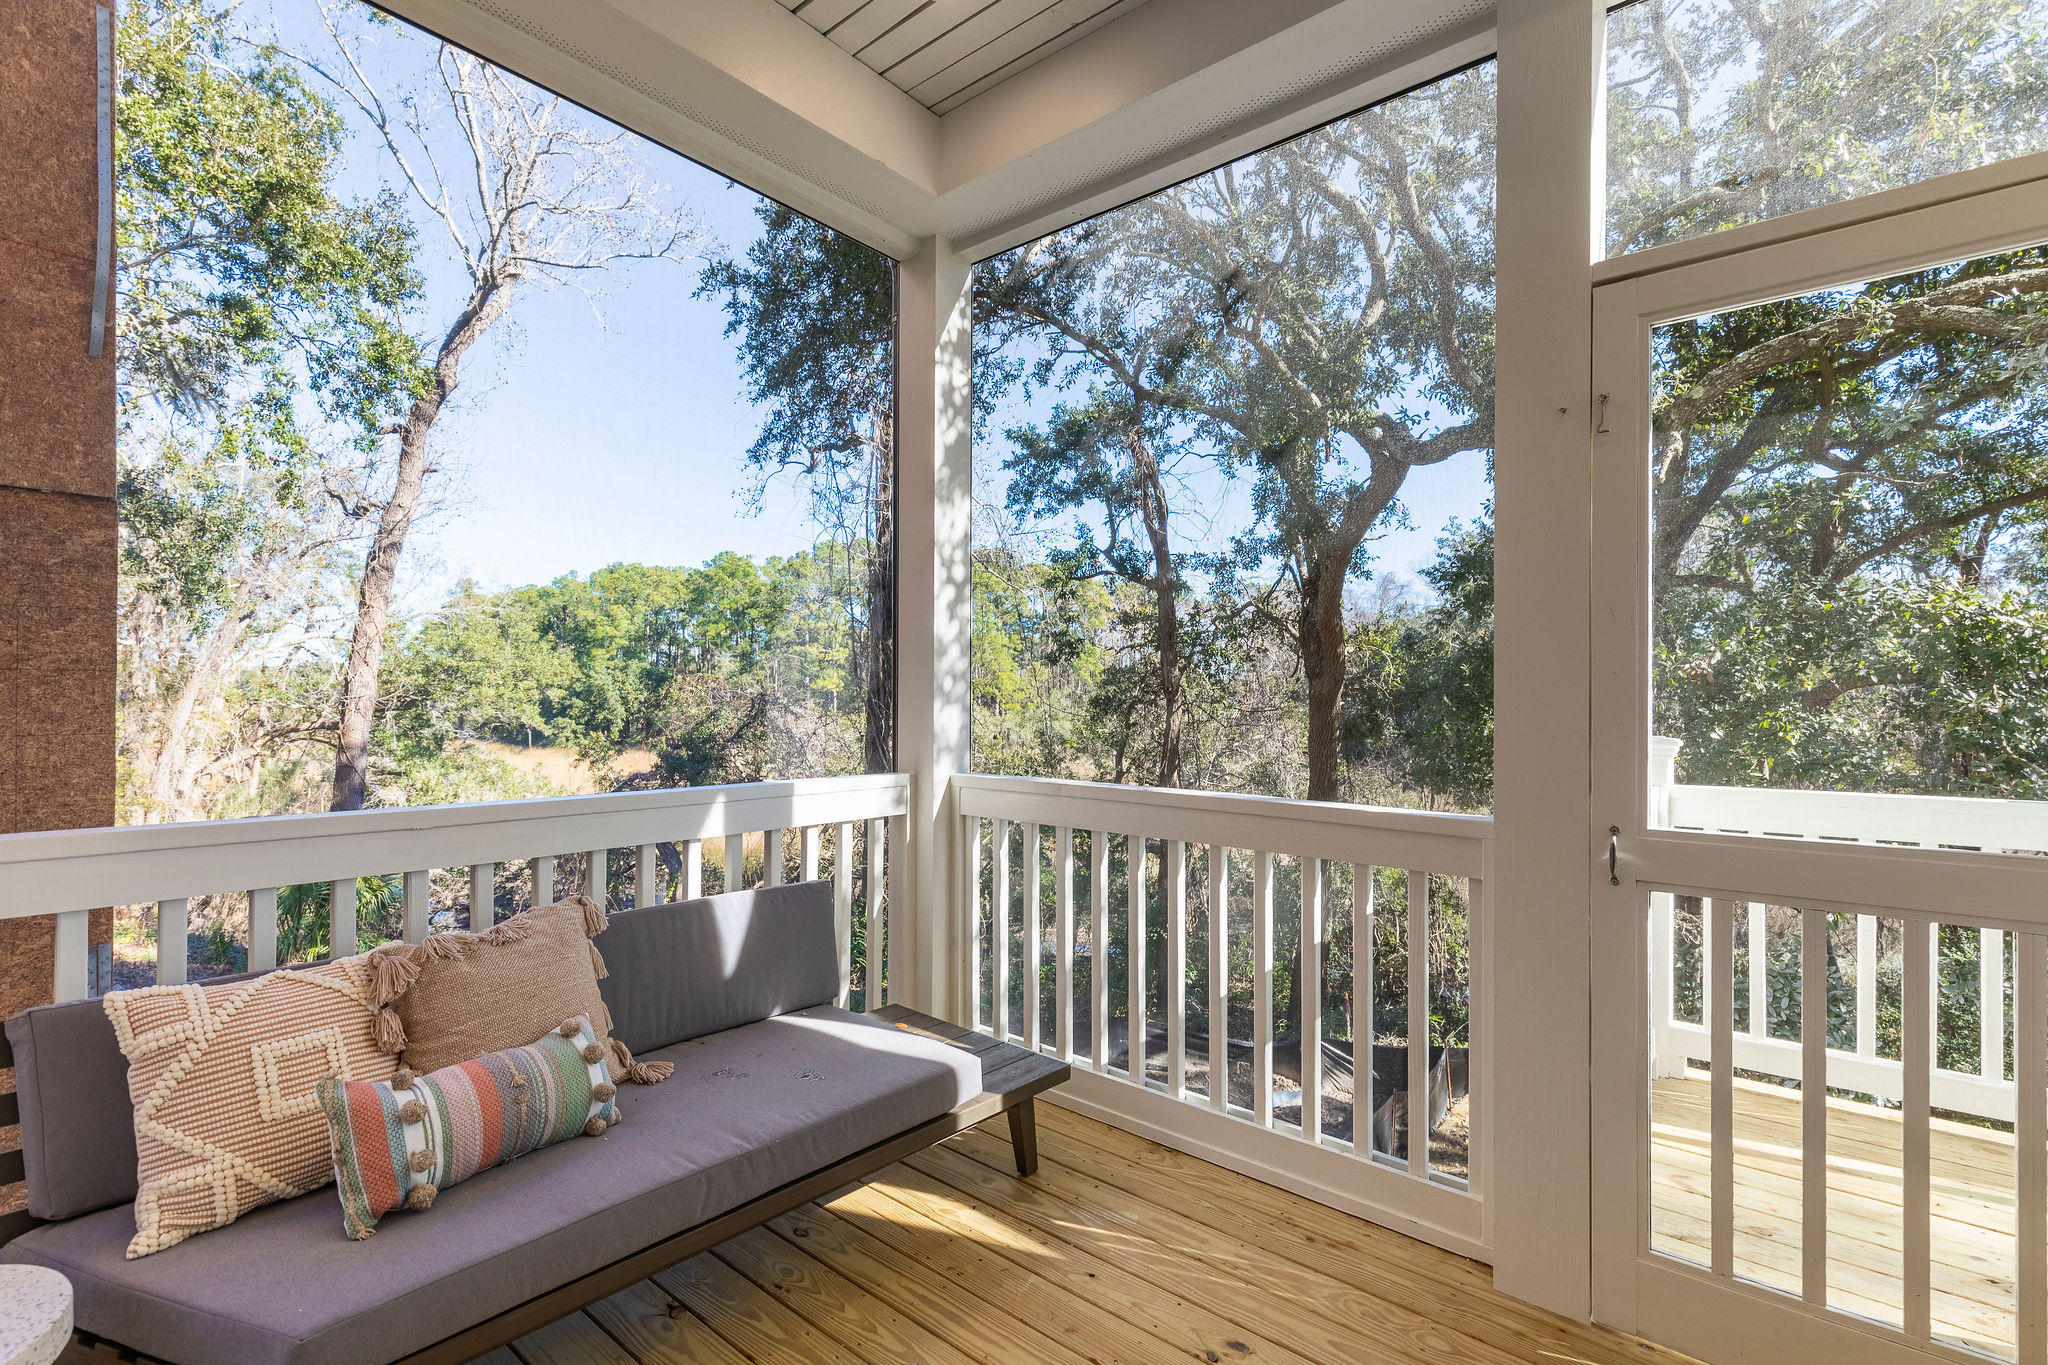 Avenue of Oaks Homes For Sale - 1027 Avenue Of Oaks, Charleston, SC - 27